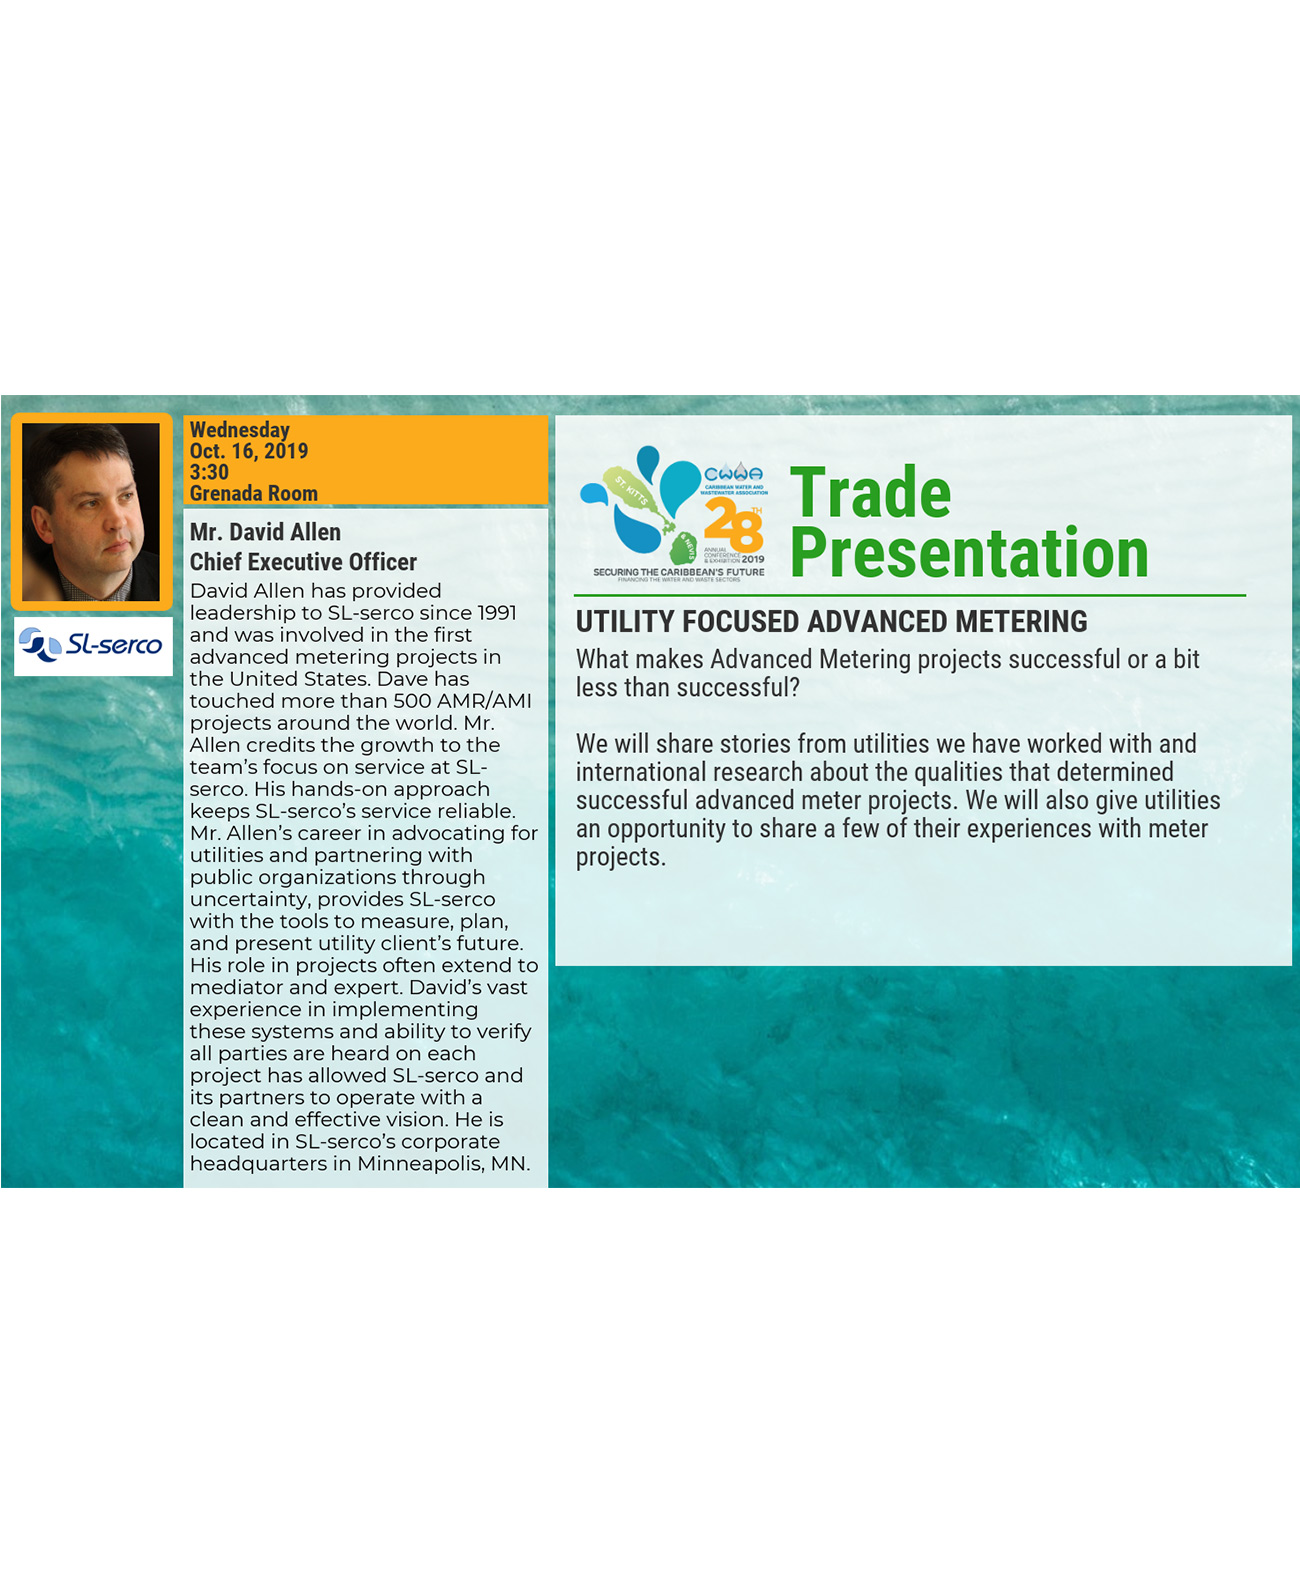 Trade Presentation - Utility Focused Advanced Metering